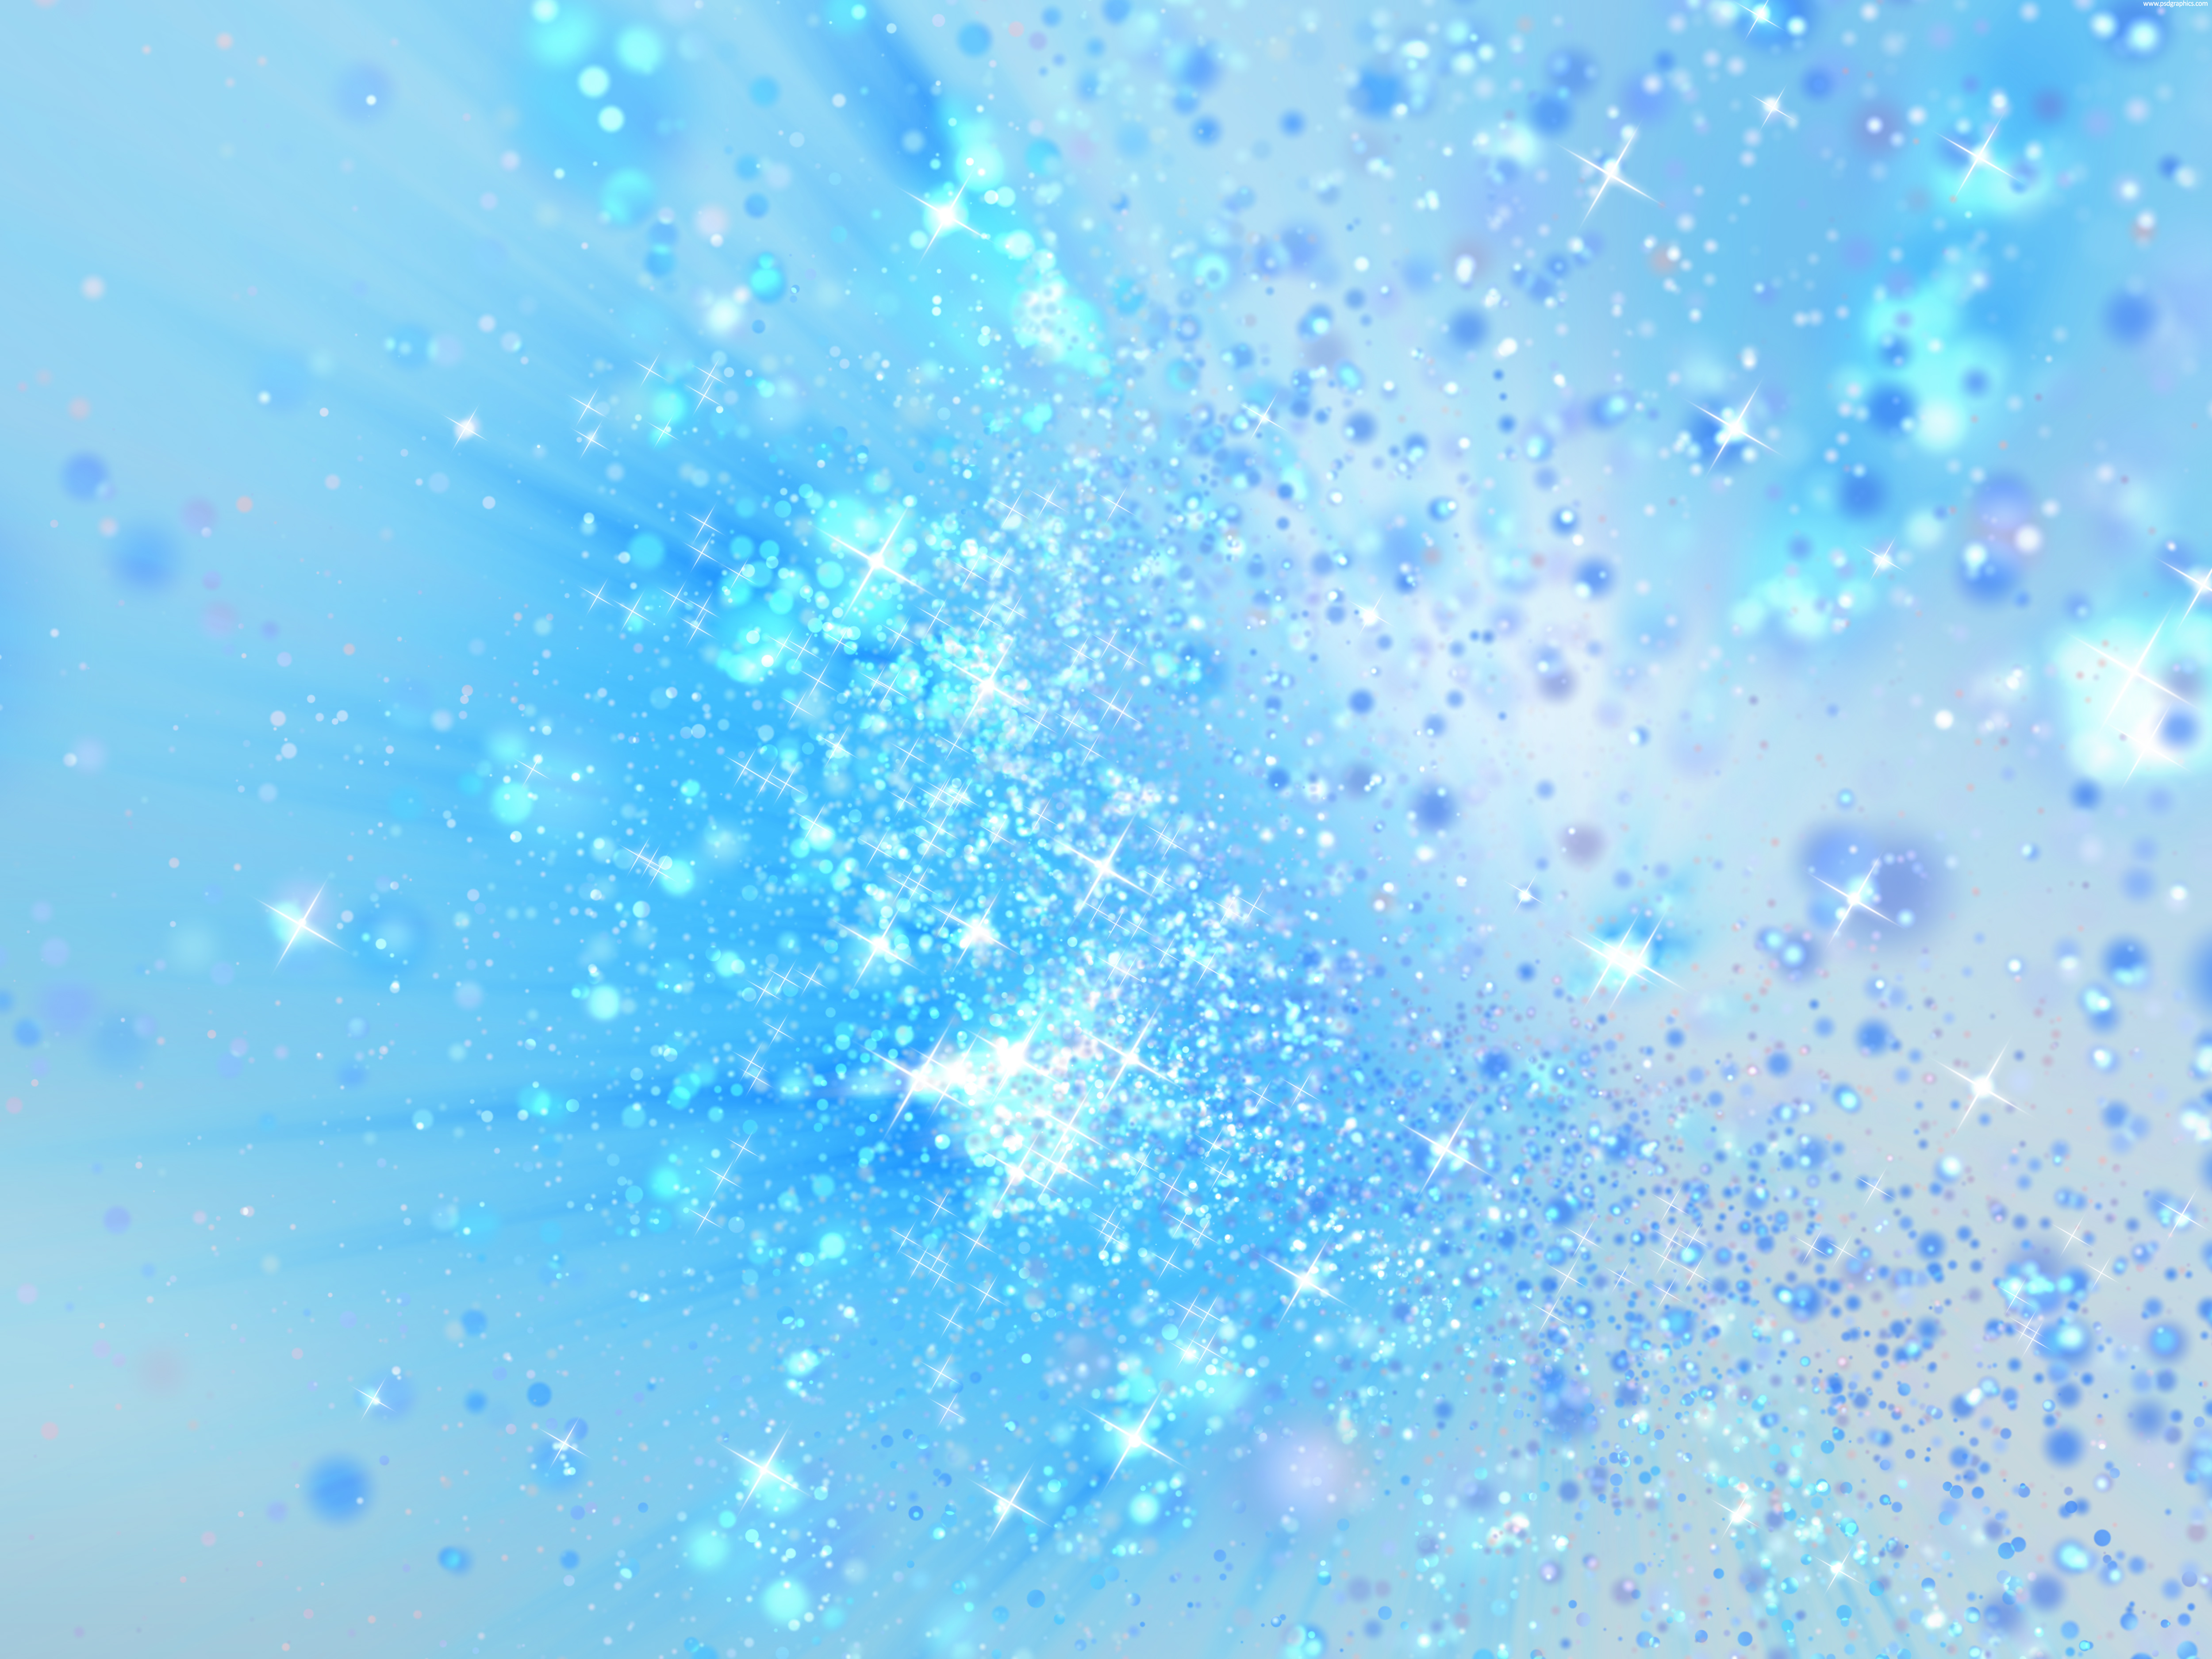 [48+] Blue Sparkle Wallpaper on WallpaperSafari